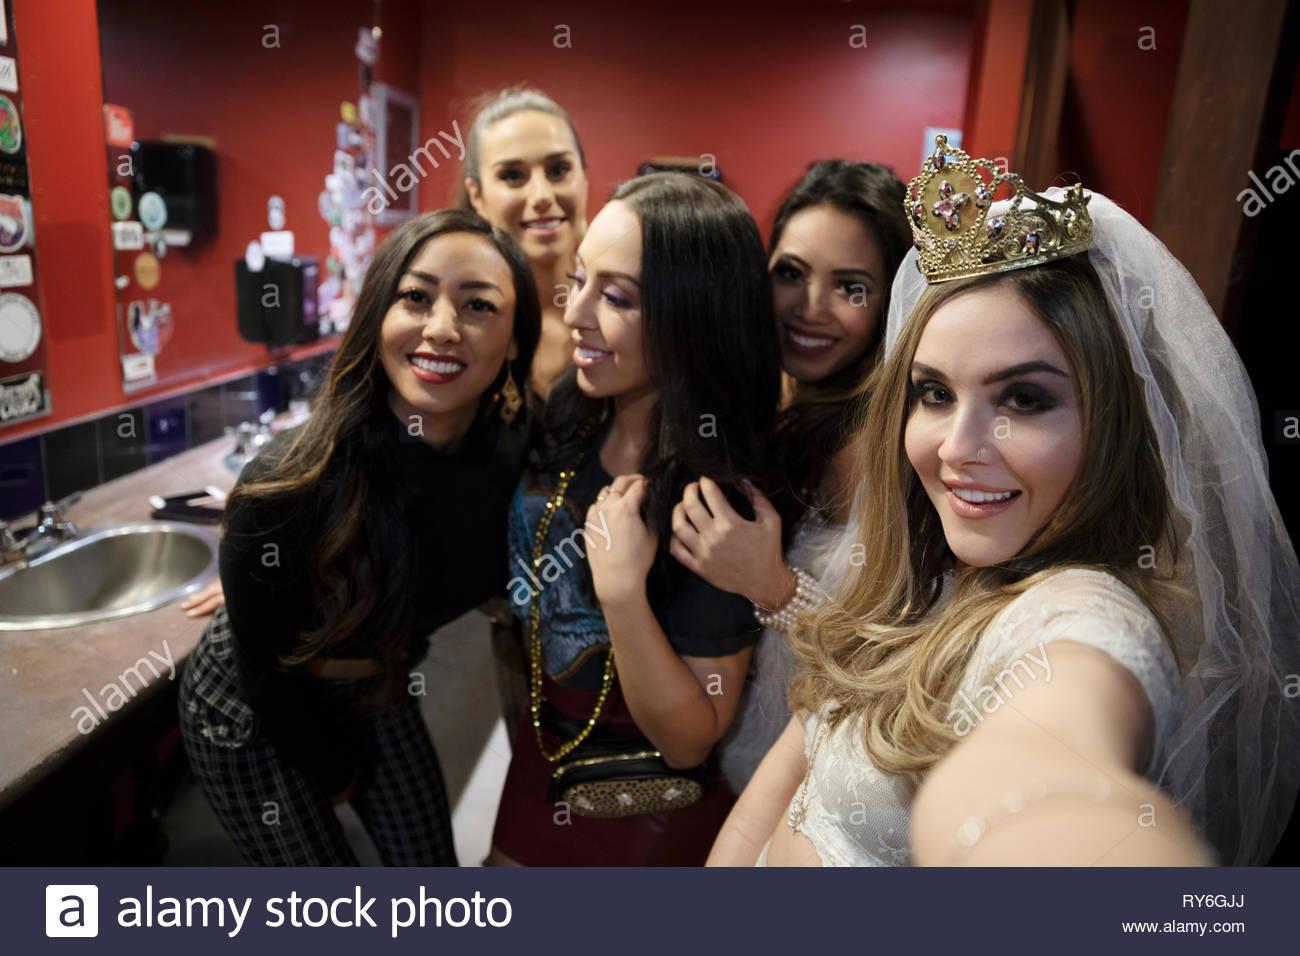 Point de vue selfies et bachelorette friends in nightclub salle de bains Photo Stock